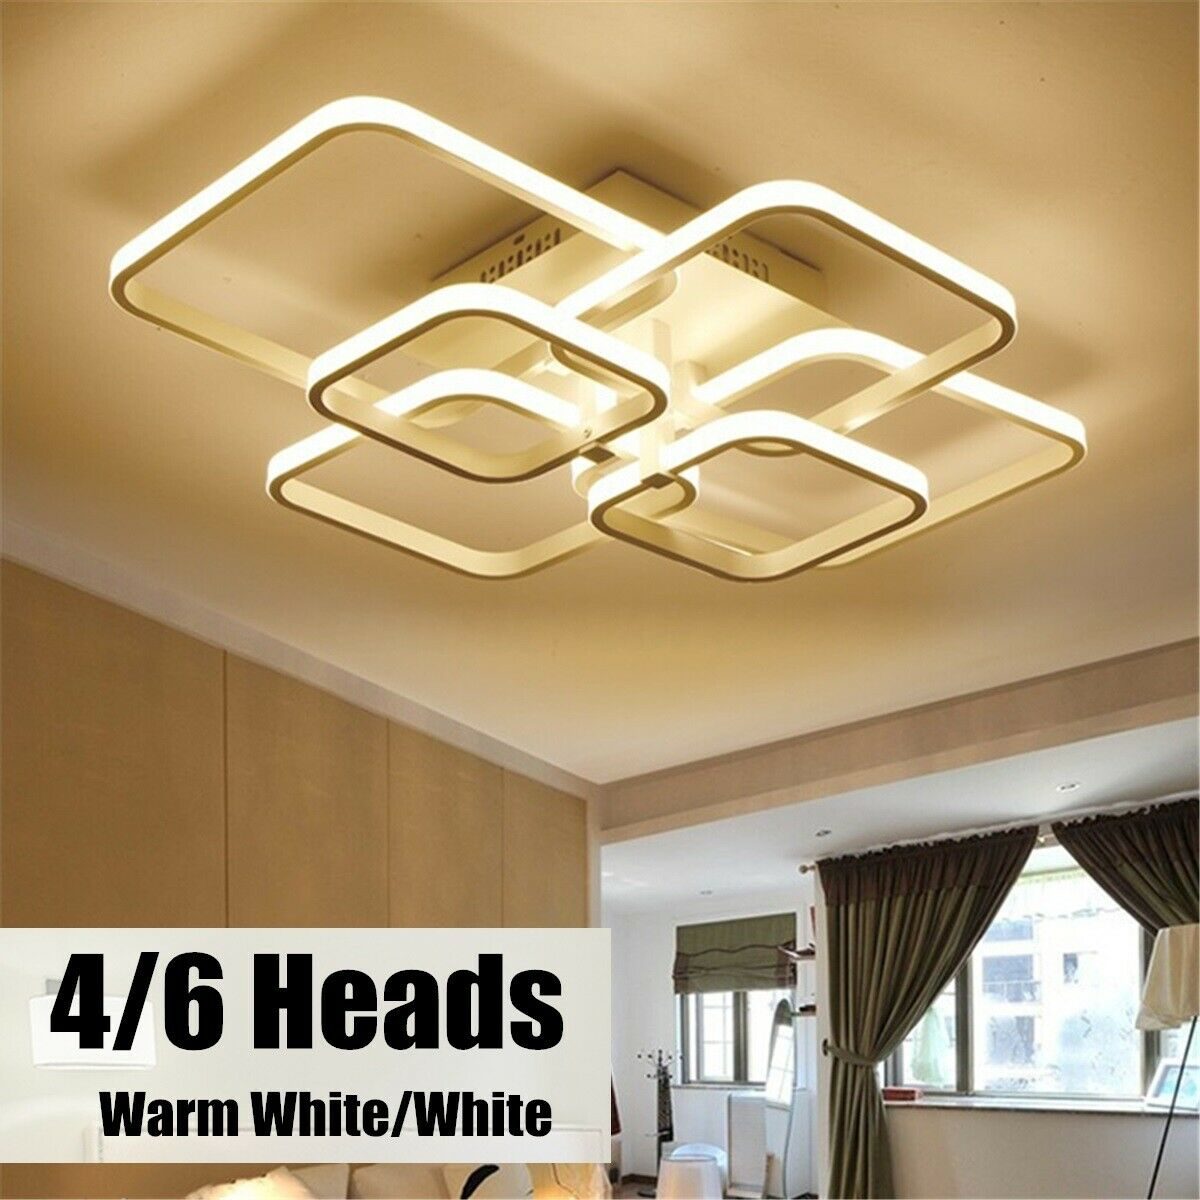 Three Heads Wooden Airplane Lights Children S Bedroom Ceiling Lamps Led Lighting For Sale Online Ebay